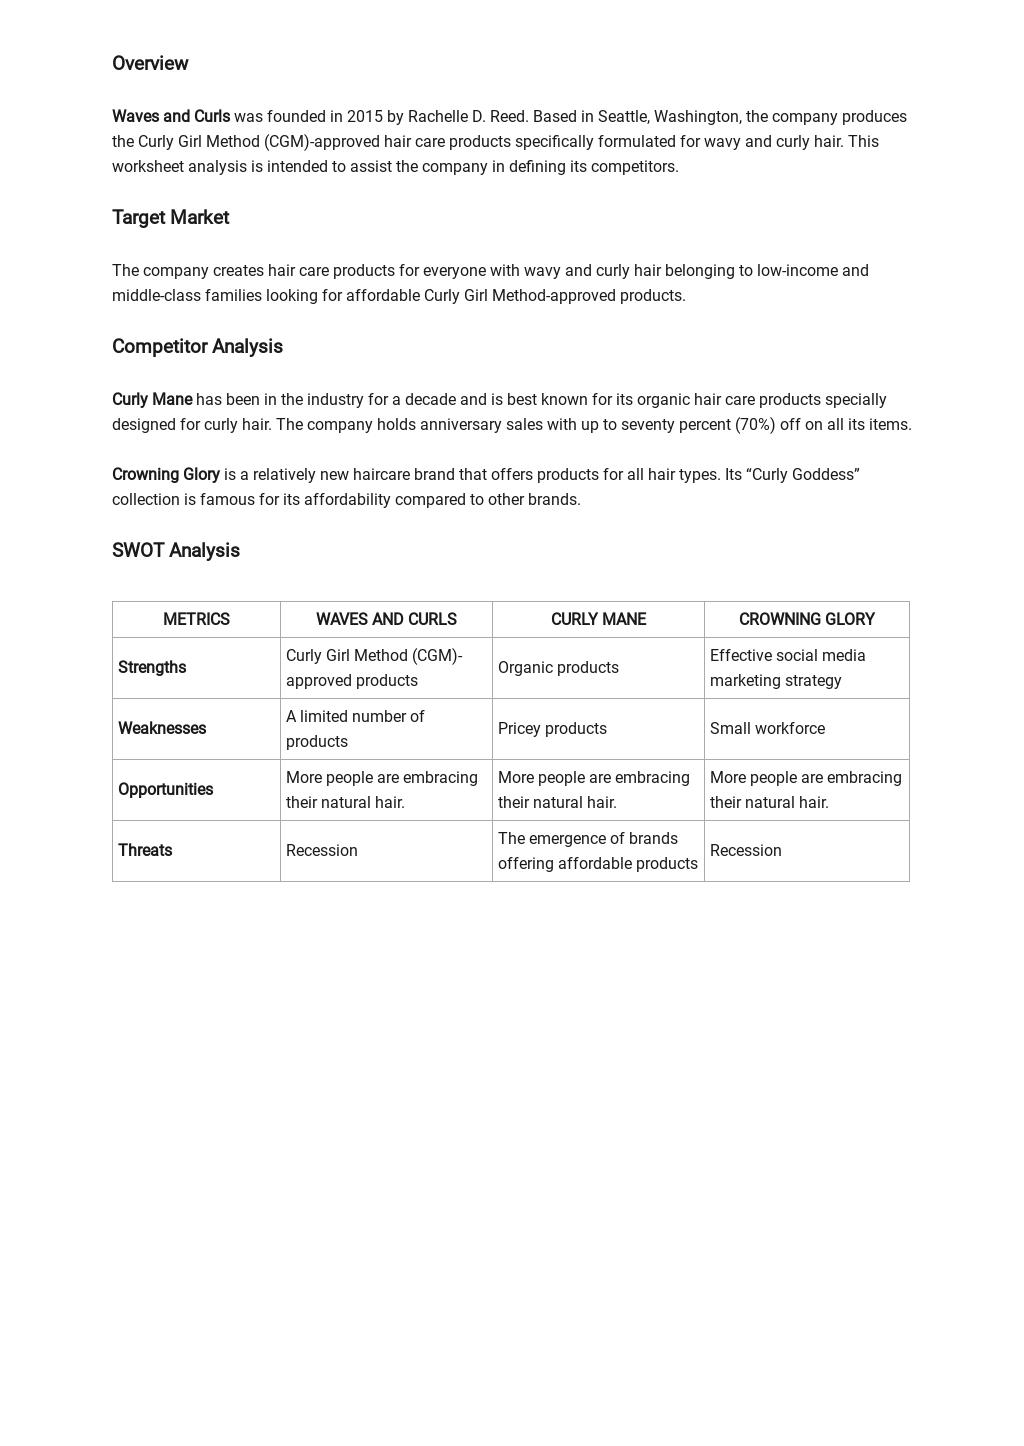 Worksheet Competitor Analysis Template [Free PDF] - Google Docs, Word